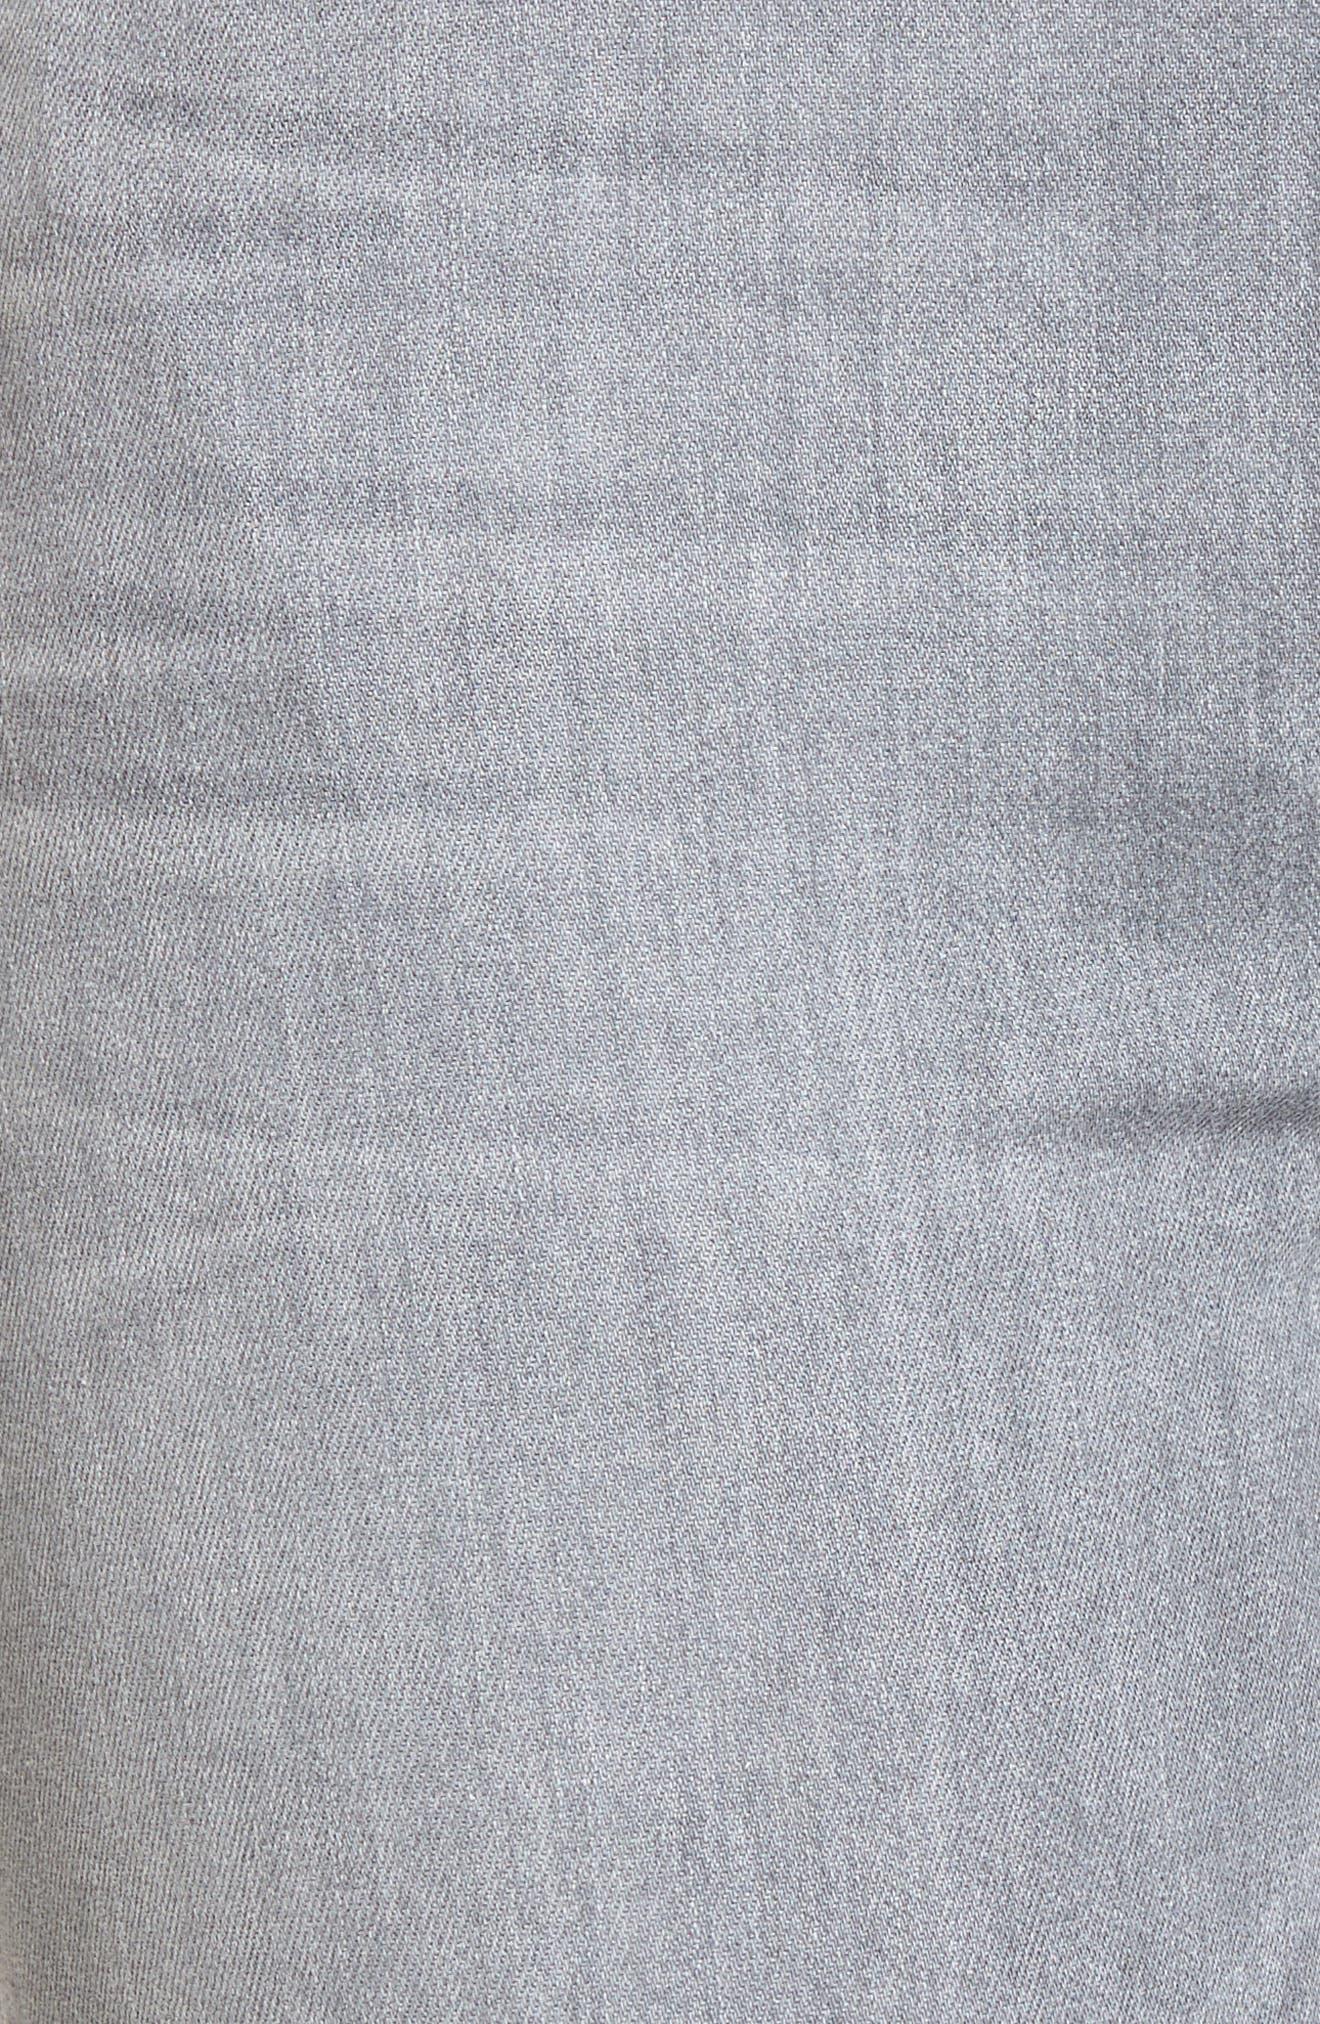 Rocket High Waist Crop Skinny Jeans,                             Alternate thumbnail 6, color,                             Rapture